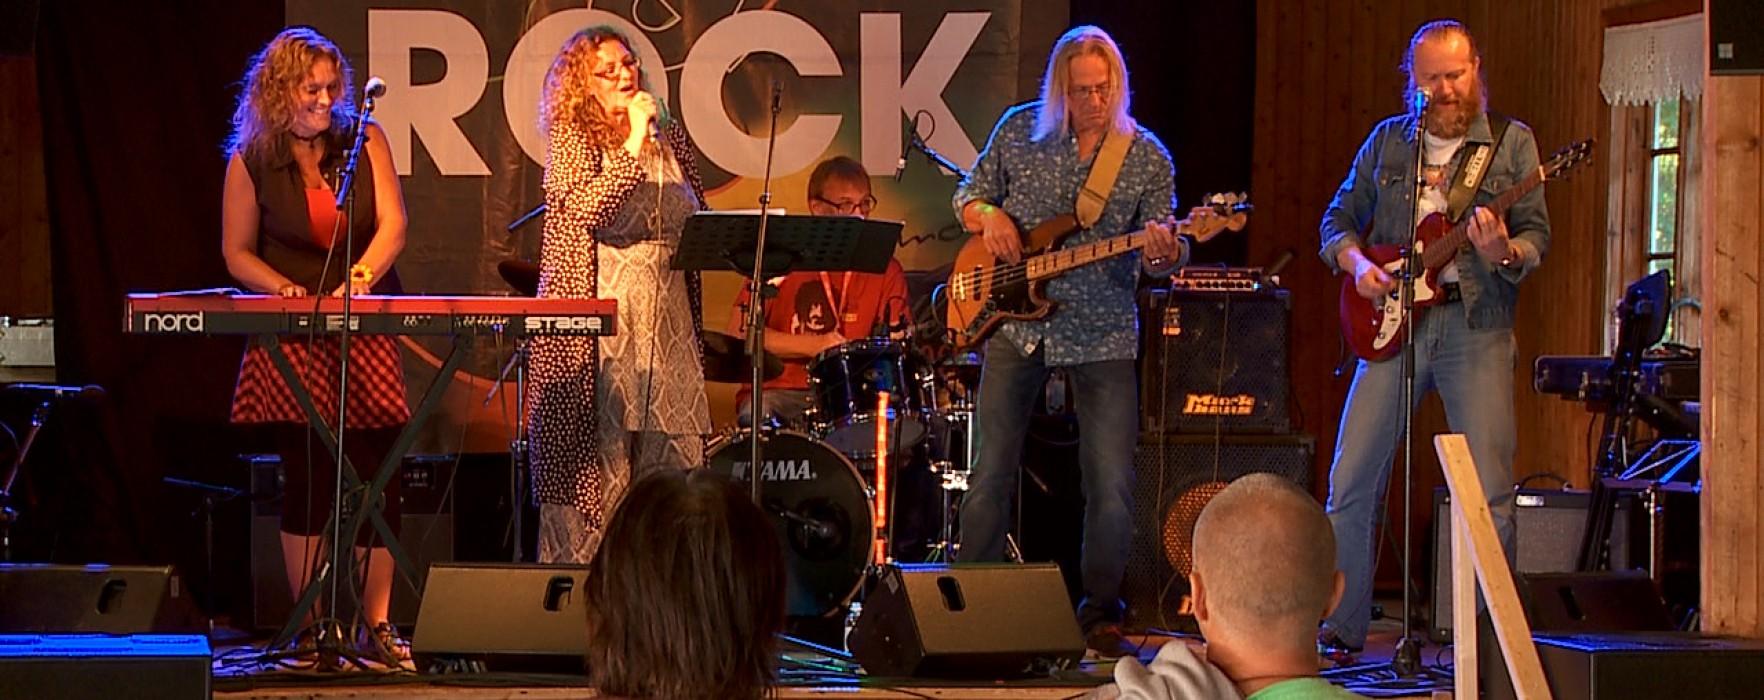 Glimt – Folk & Rock i Segmon, Granny K (ep 5:6)